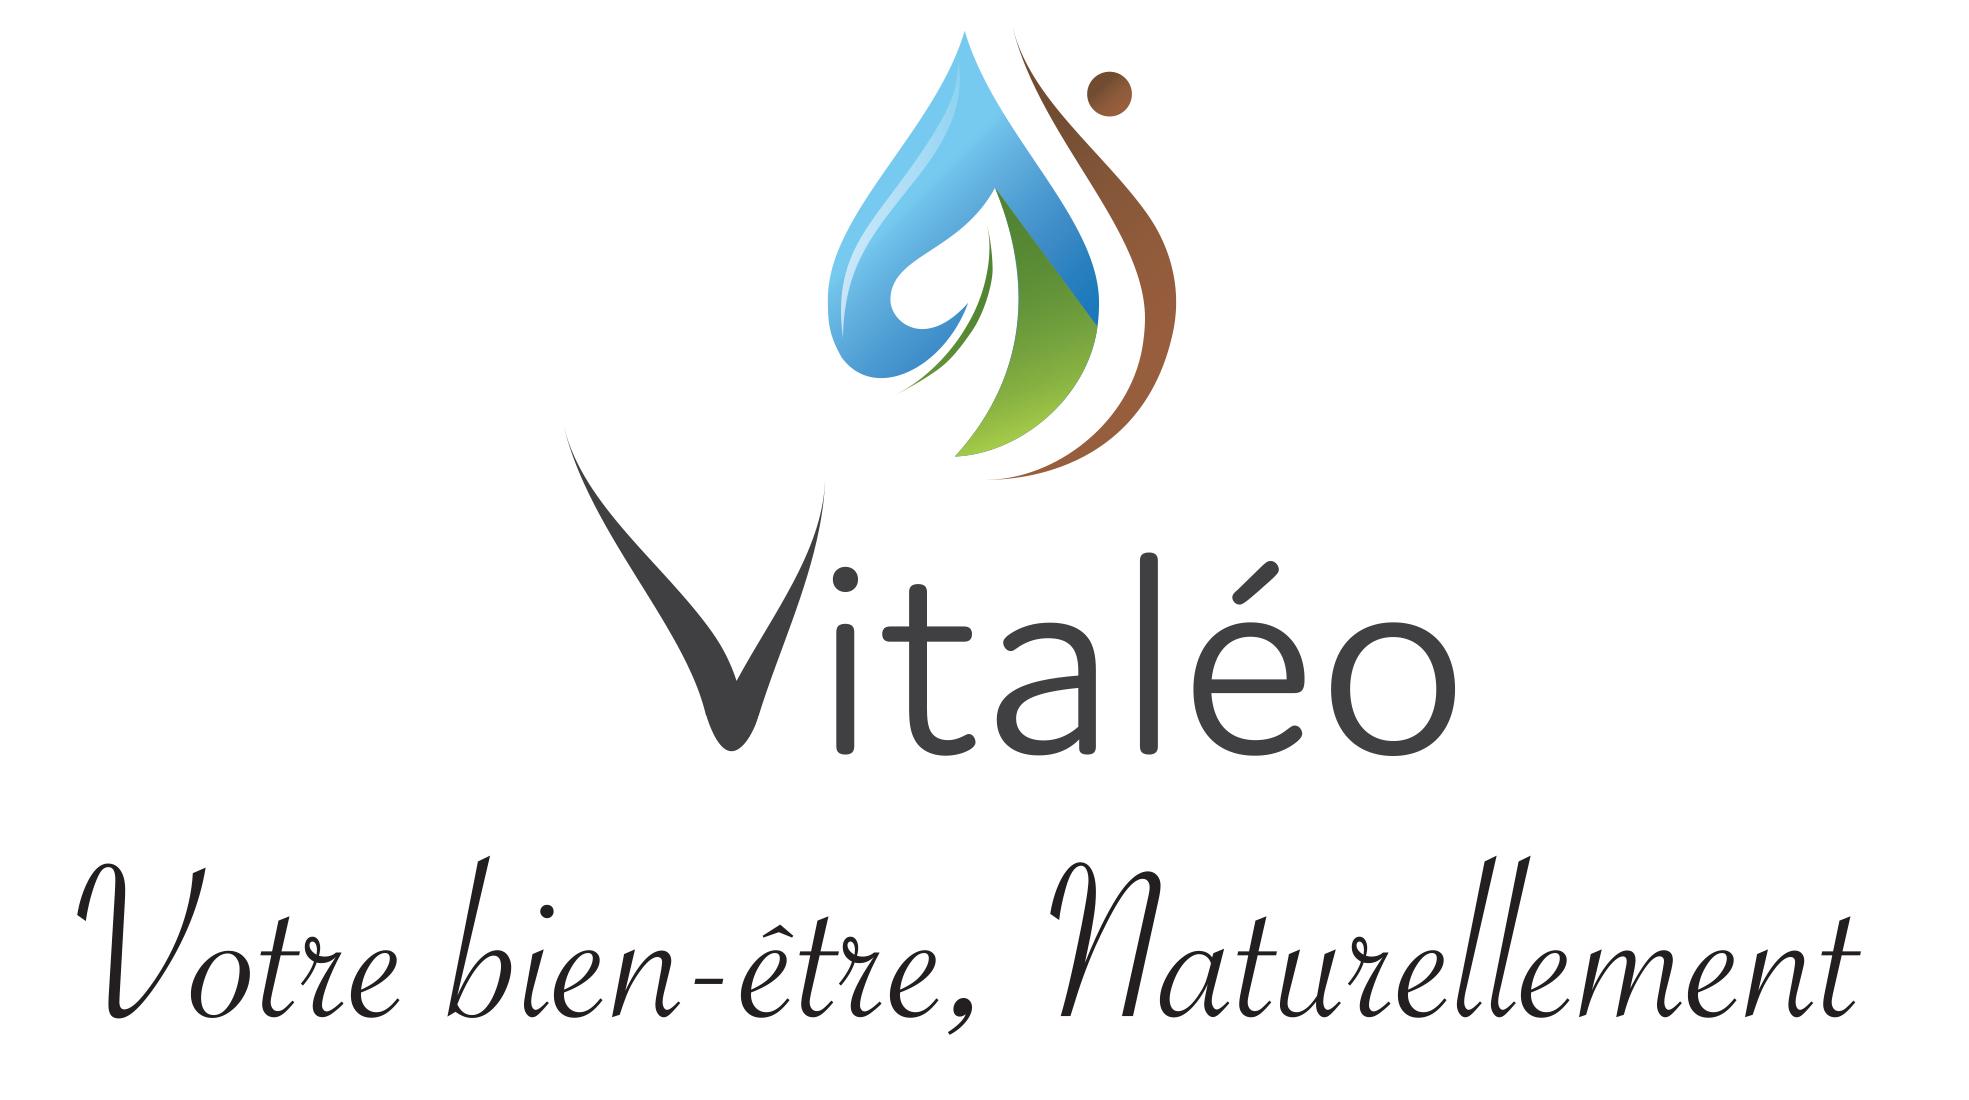 logo vitaleo-osteopathie